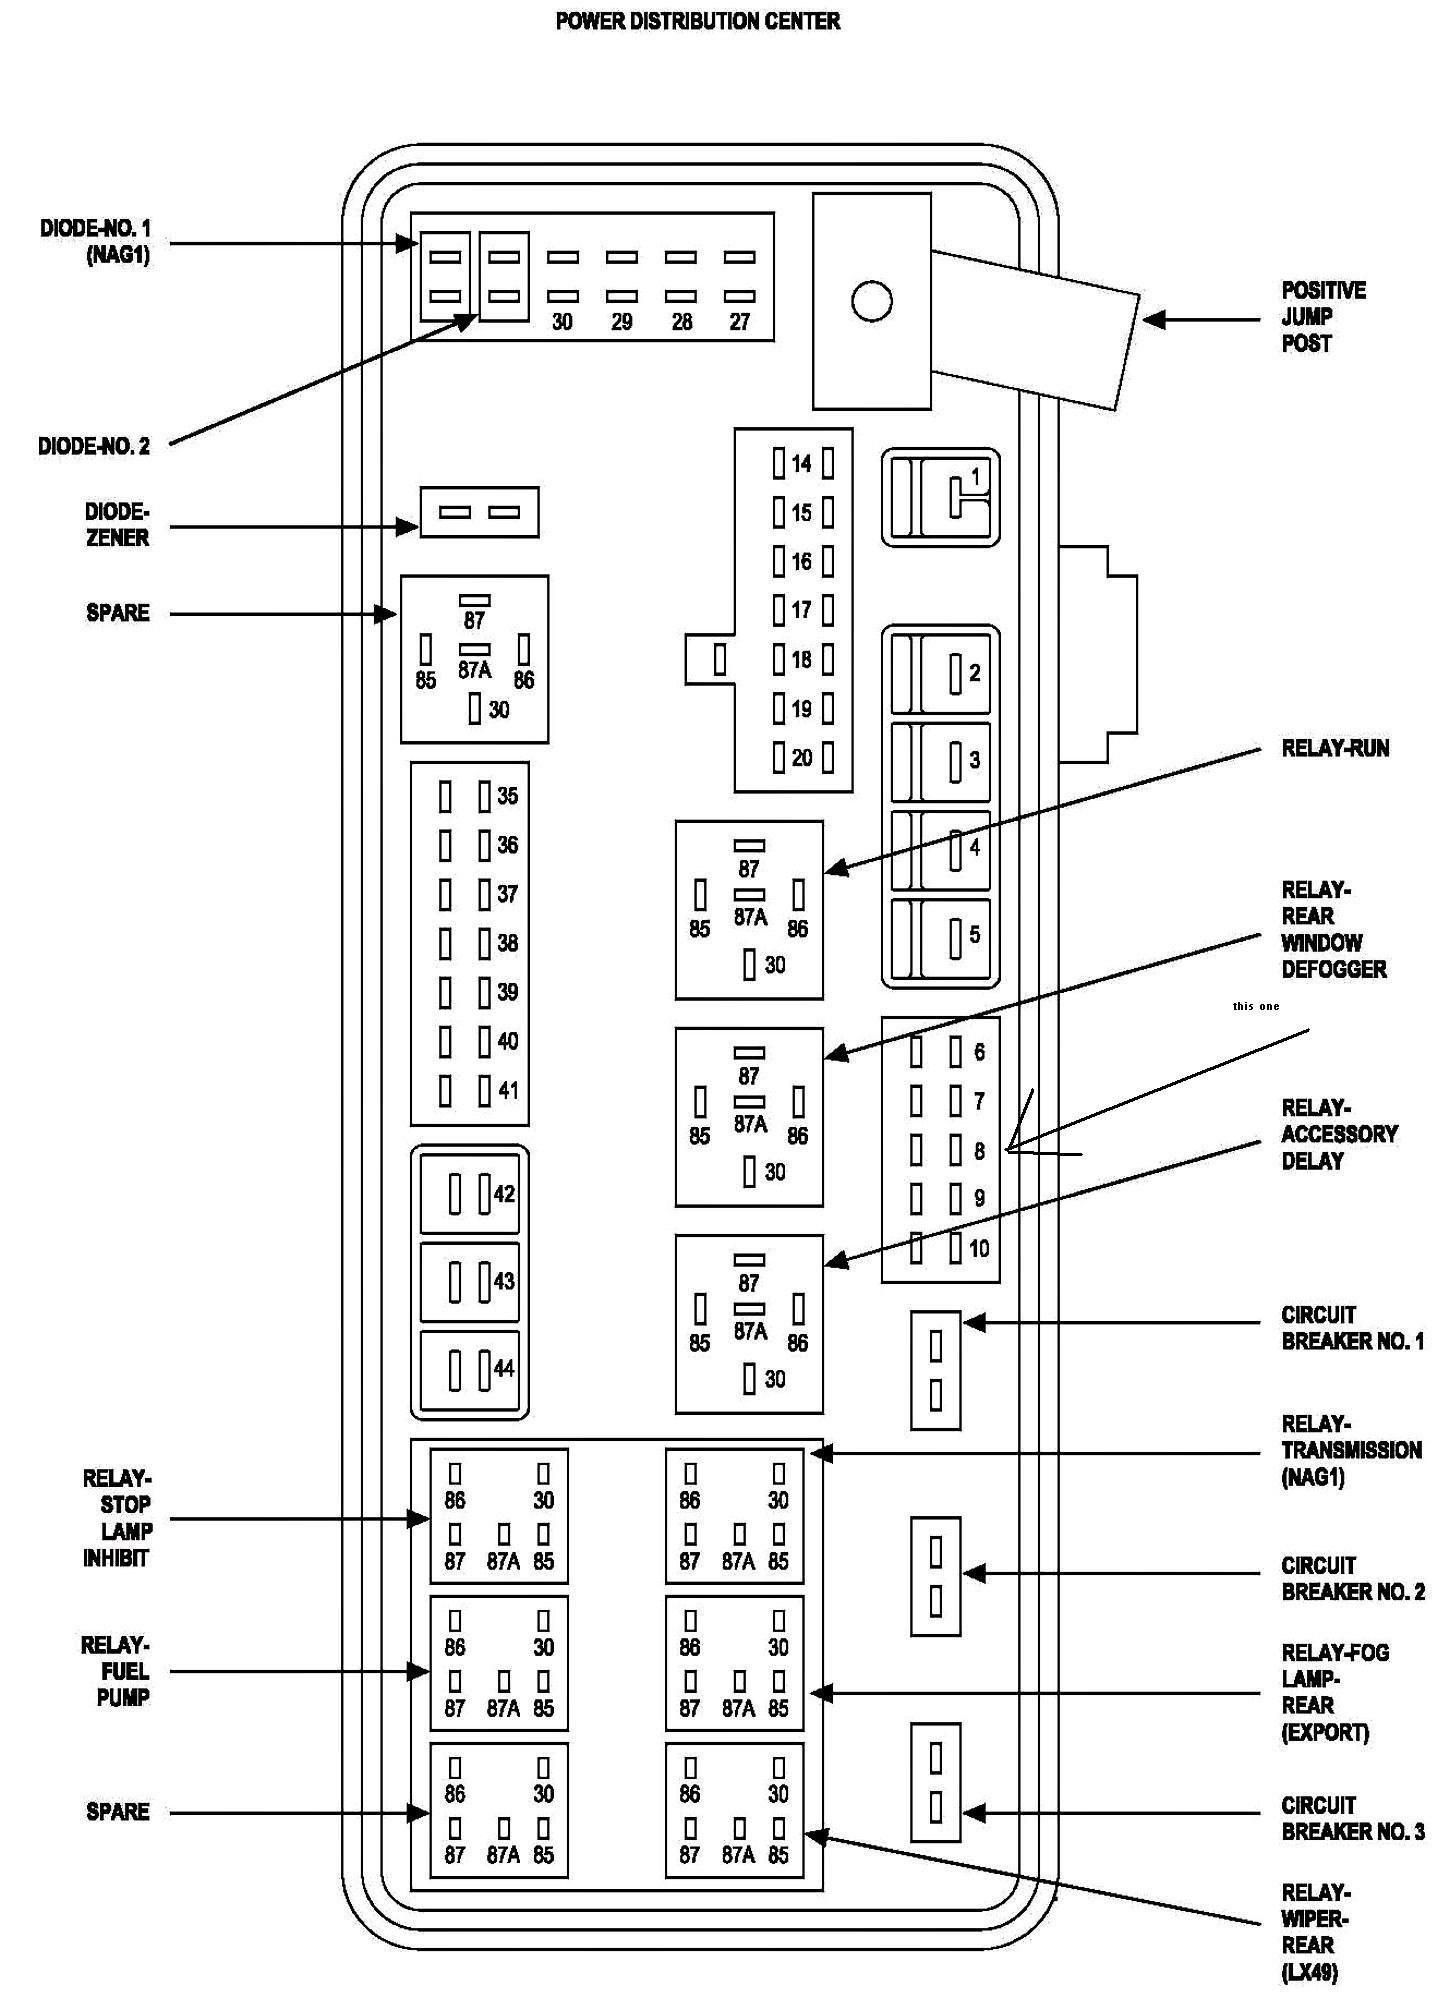 Wiring Diagram 2006 Dodge 3500 - Today Wiring Diagram - 2007 Dodge Ram Wiring Diagram